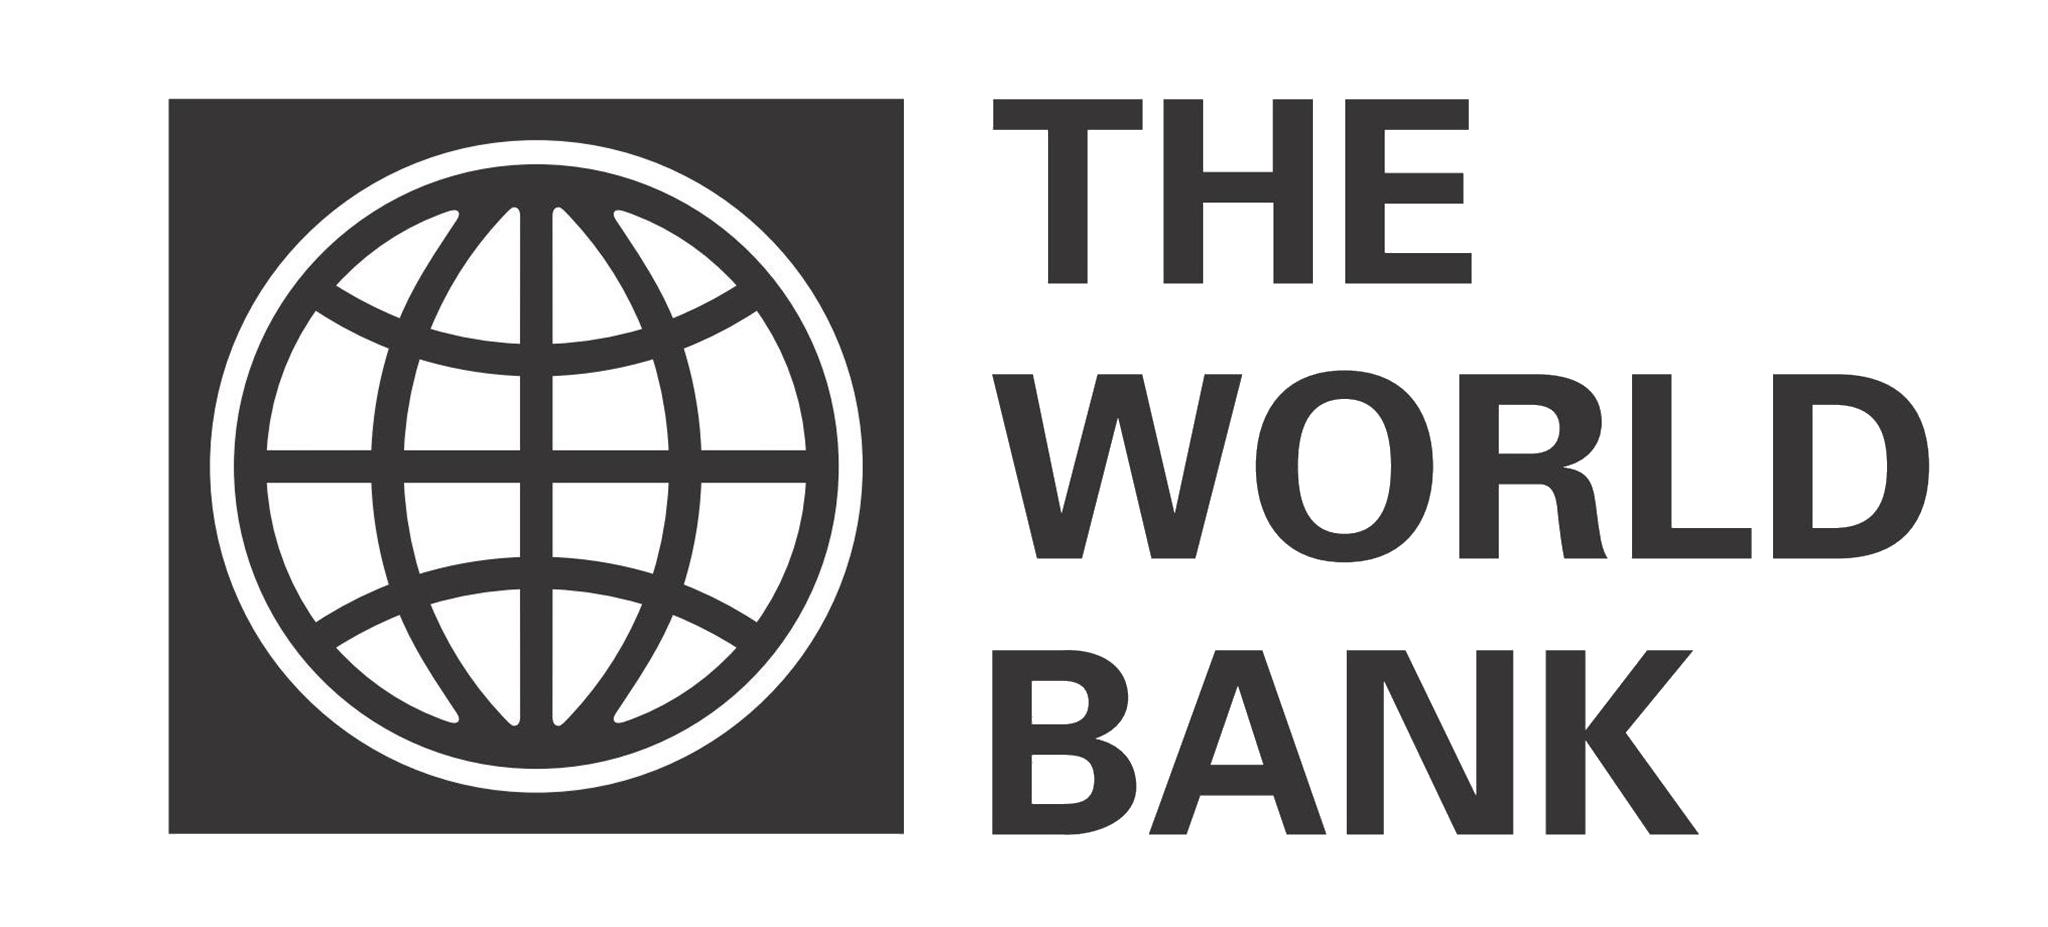 पाँच अर्ब ९४ करोड सहुलियत ऋण उपलब्ध गराउन विश्व बैंक सहमत